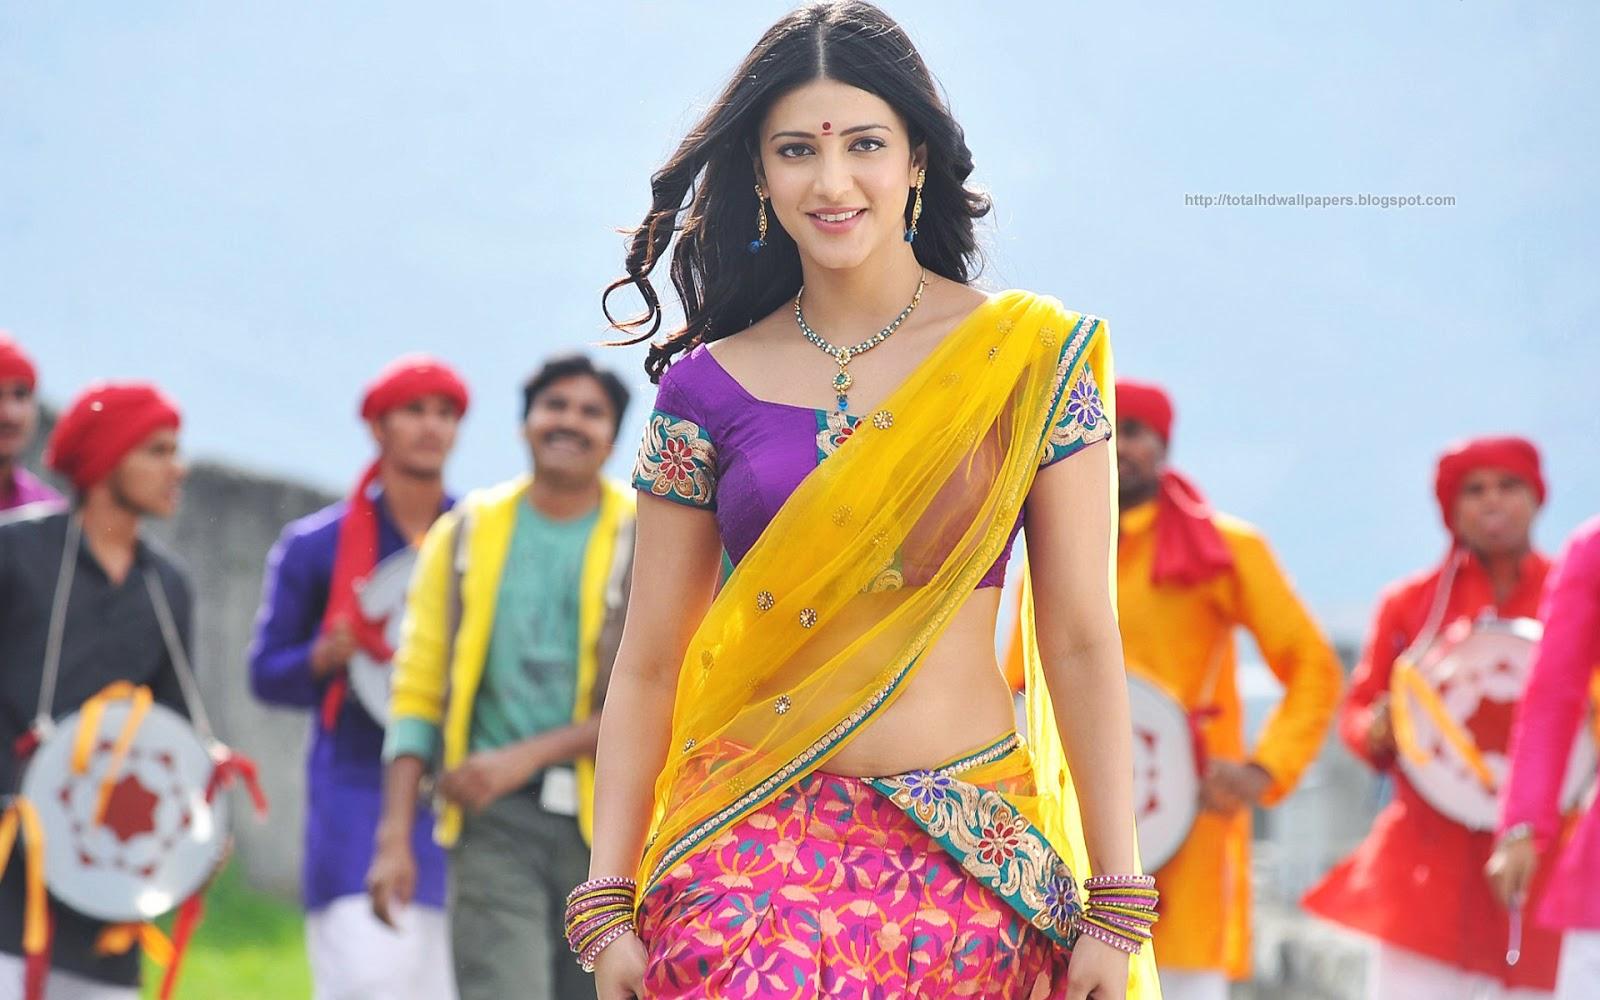 Bollywood Hd Wallpapers 1080p Shruti Hassan Wallpapers